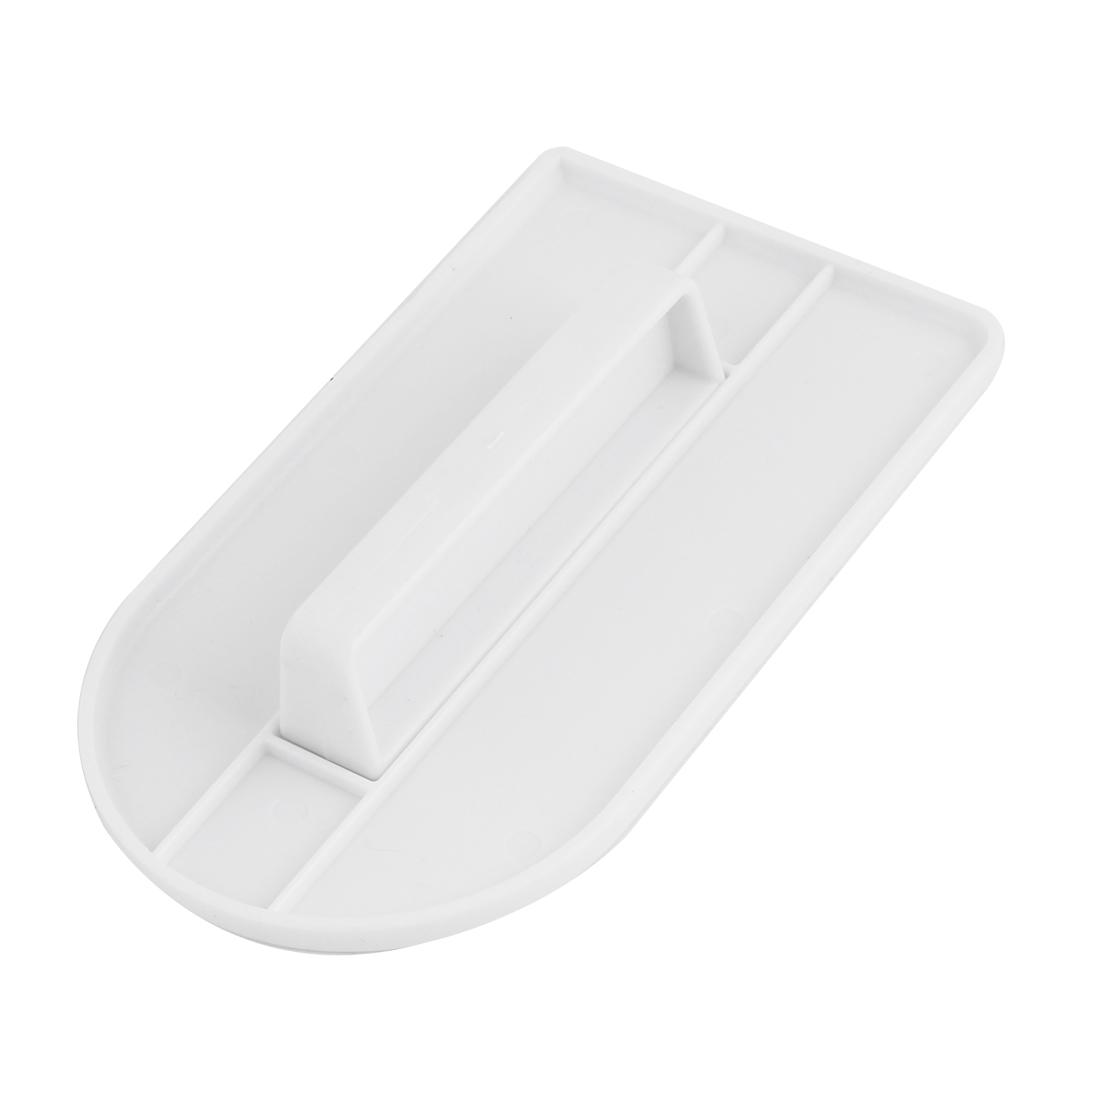 14.8cm Length White Plastic Cake Fondant Polisher Sugarcraft Tool